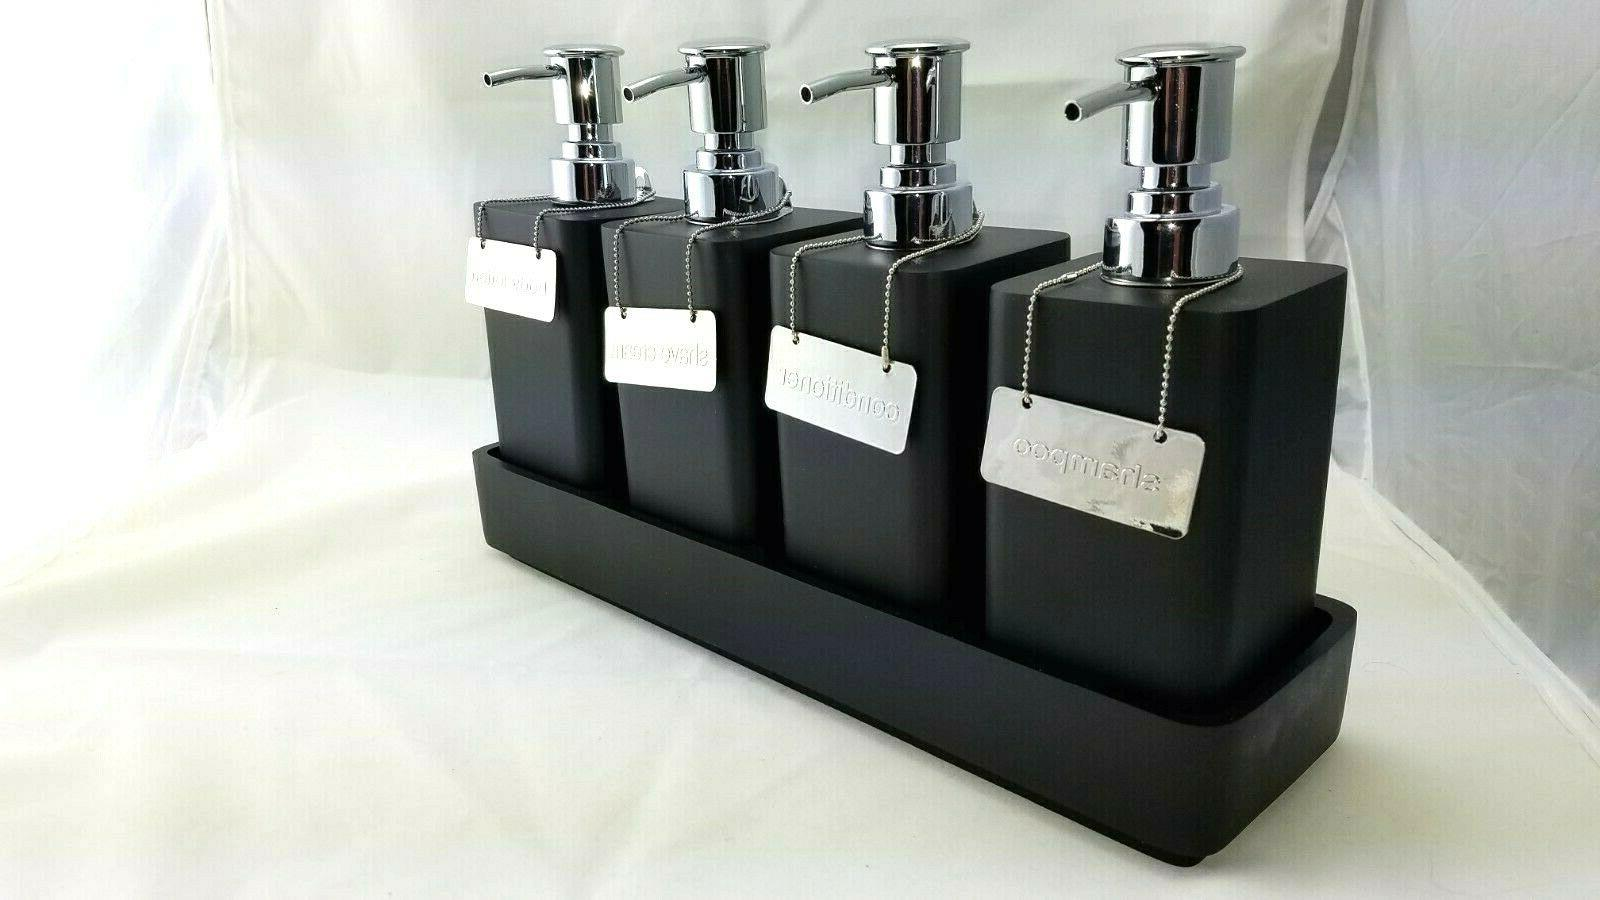 resin pump shelf set w 4 pumps